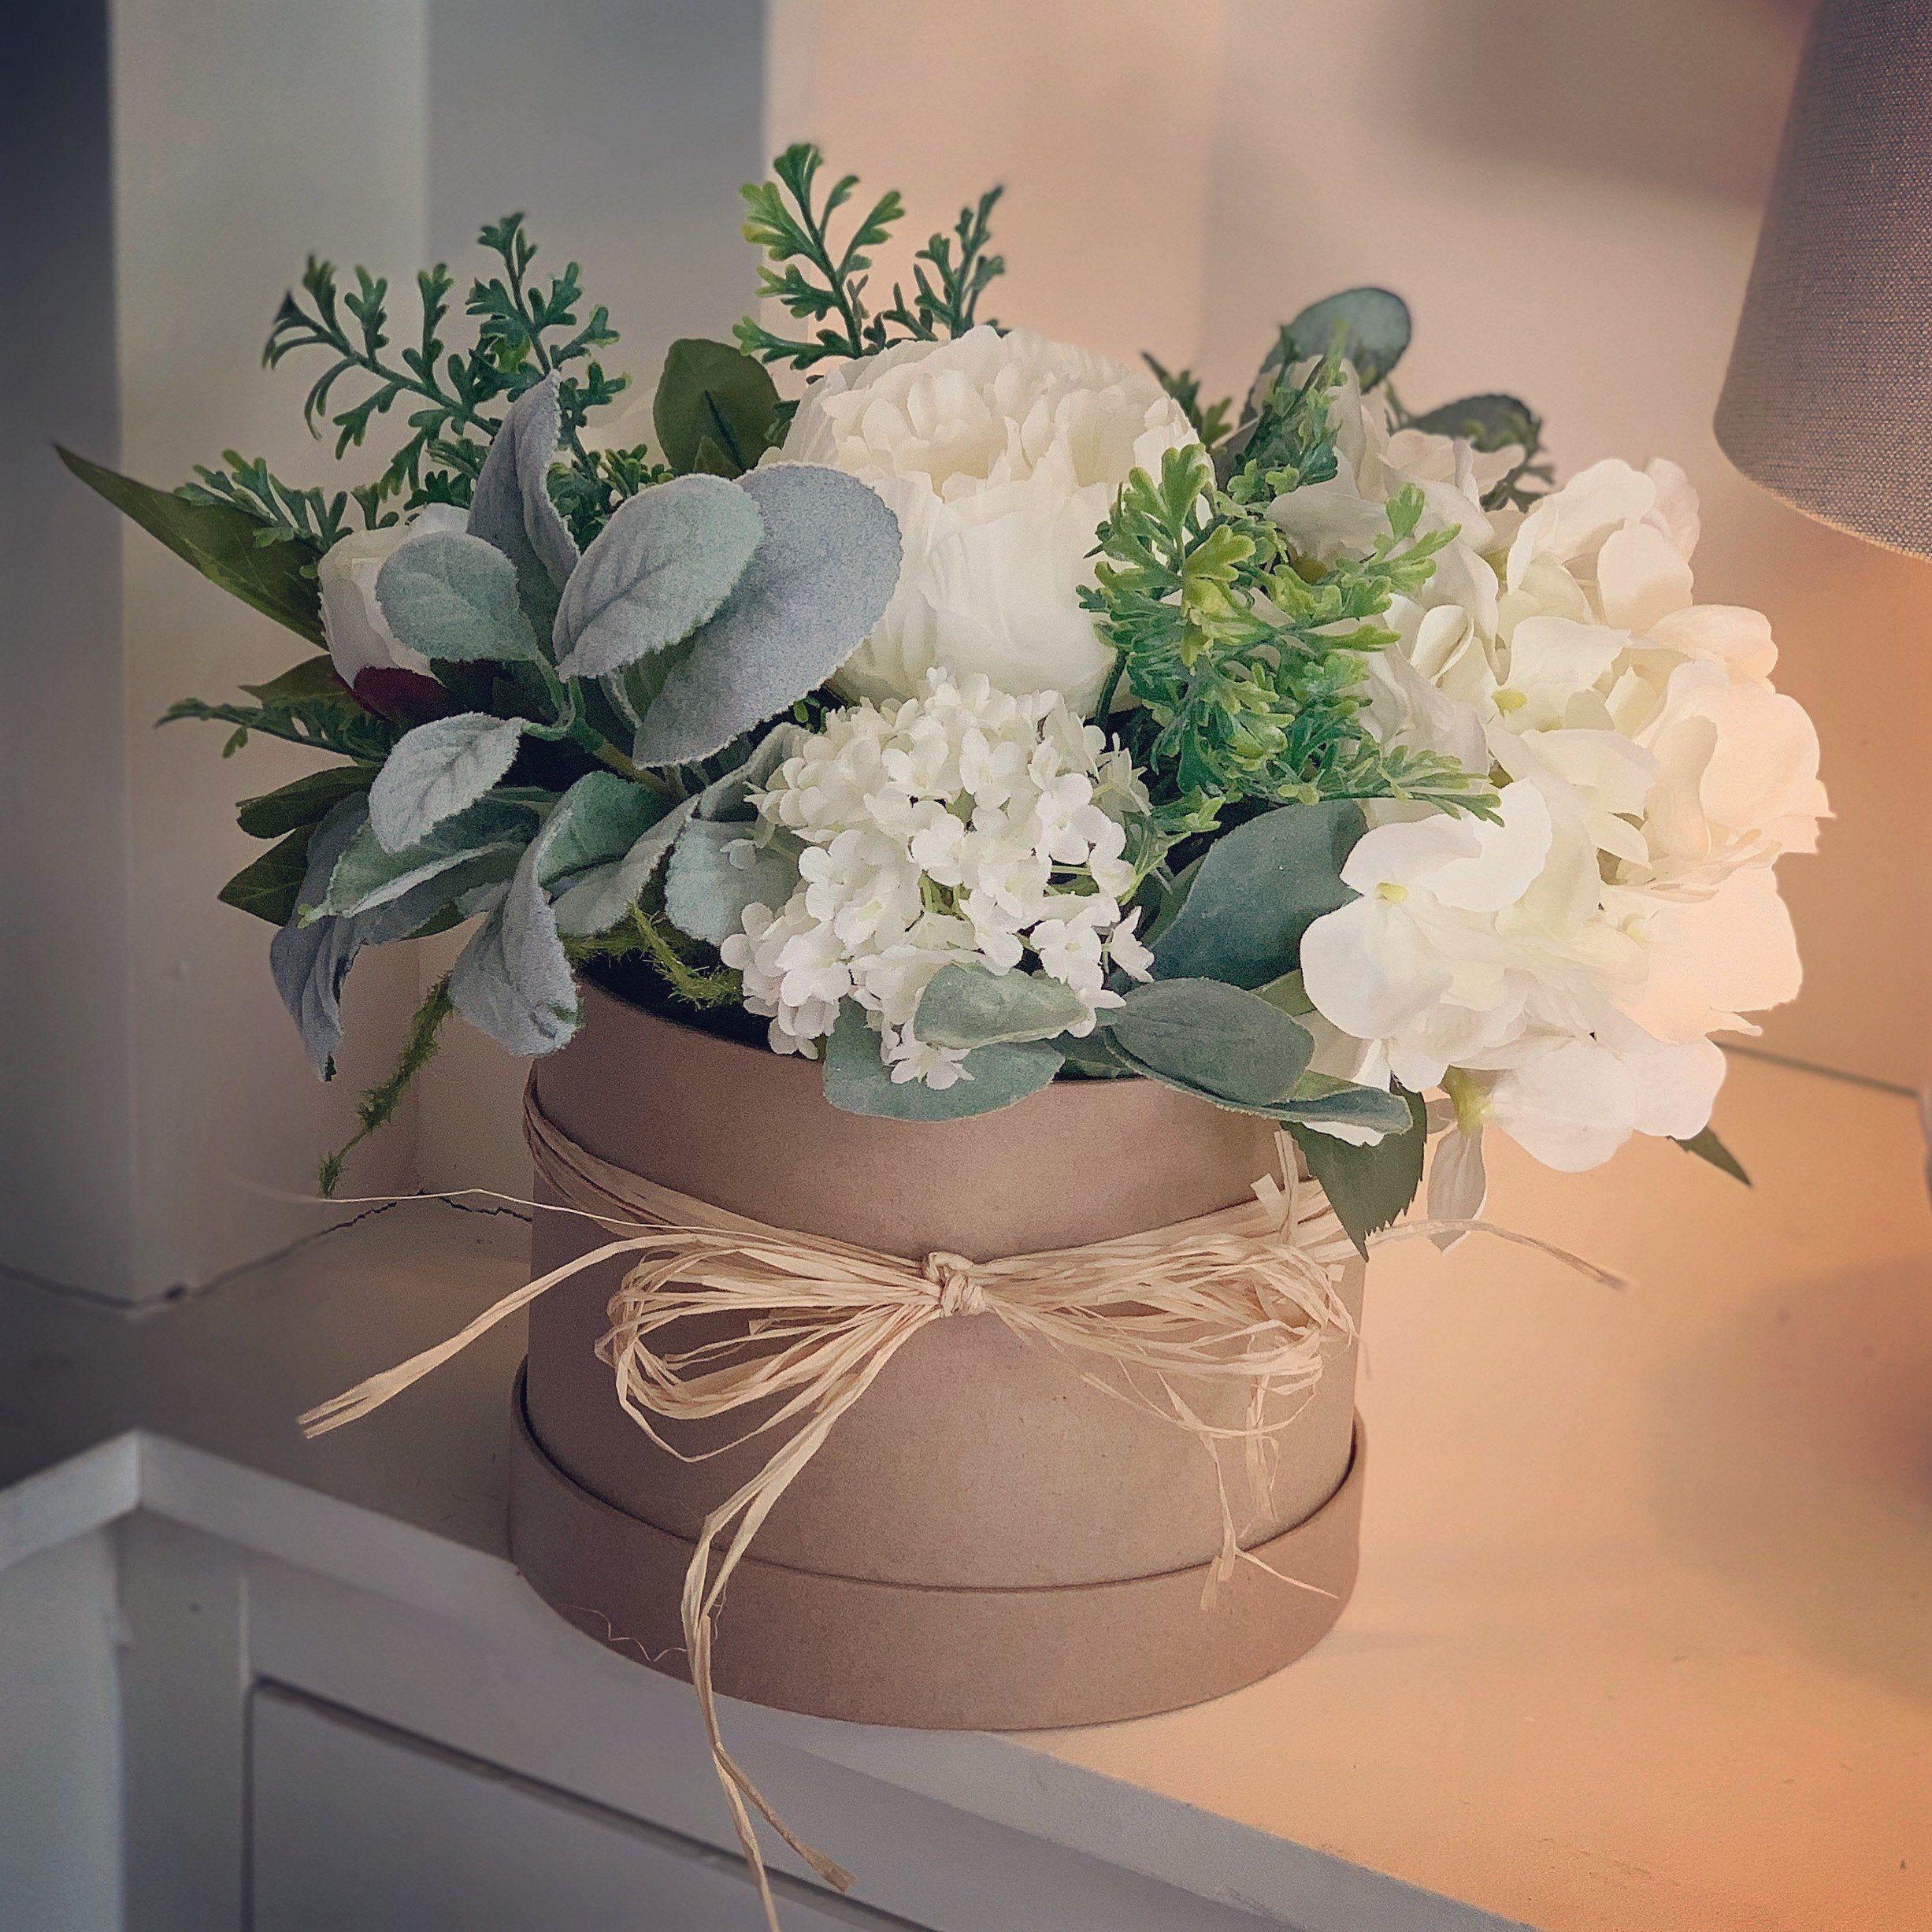 Hatbox Flowers Mothers Day Flower Arrangement Faux Flowers Artificial Flowers In 2020 Flower Arrangements Simple Flower Arrangements Diy Floral Arrangements Diy